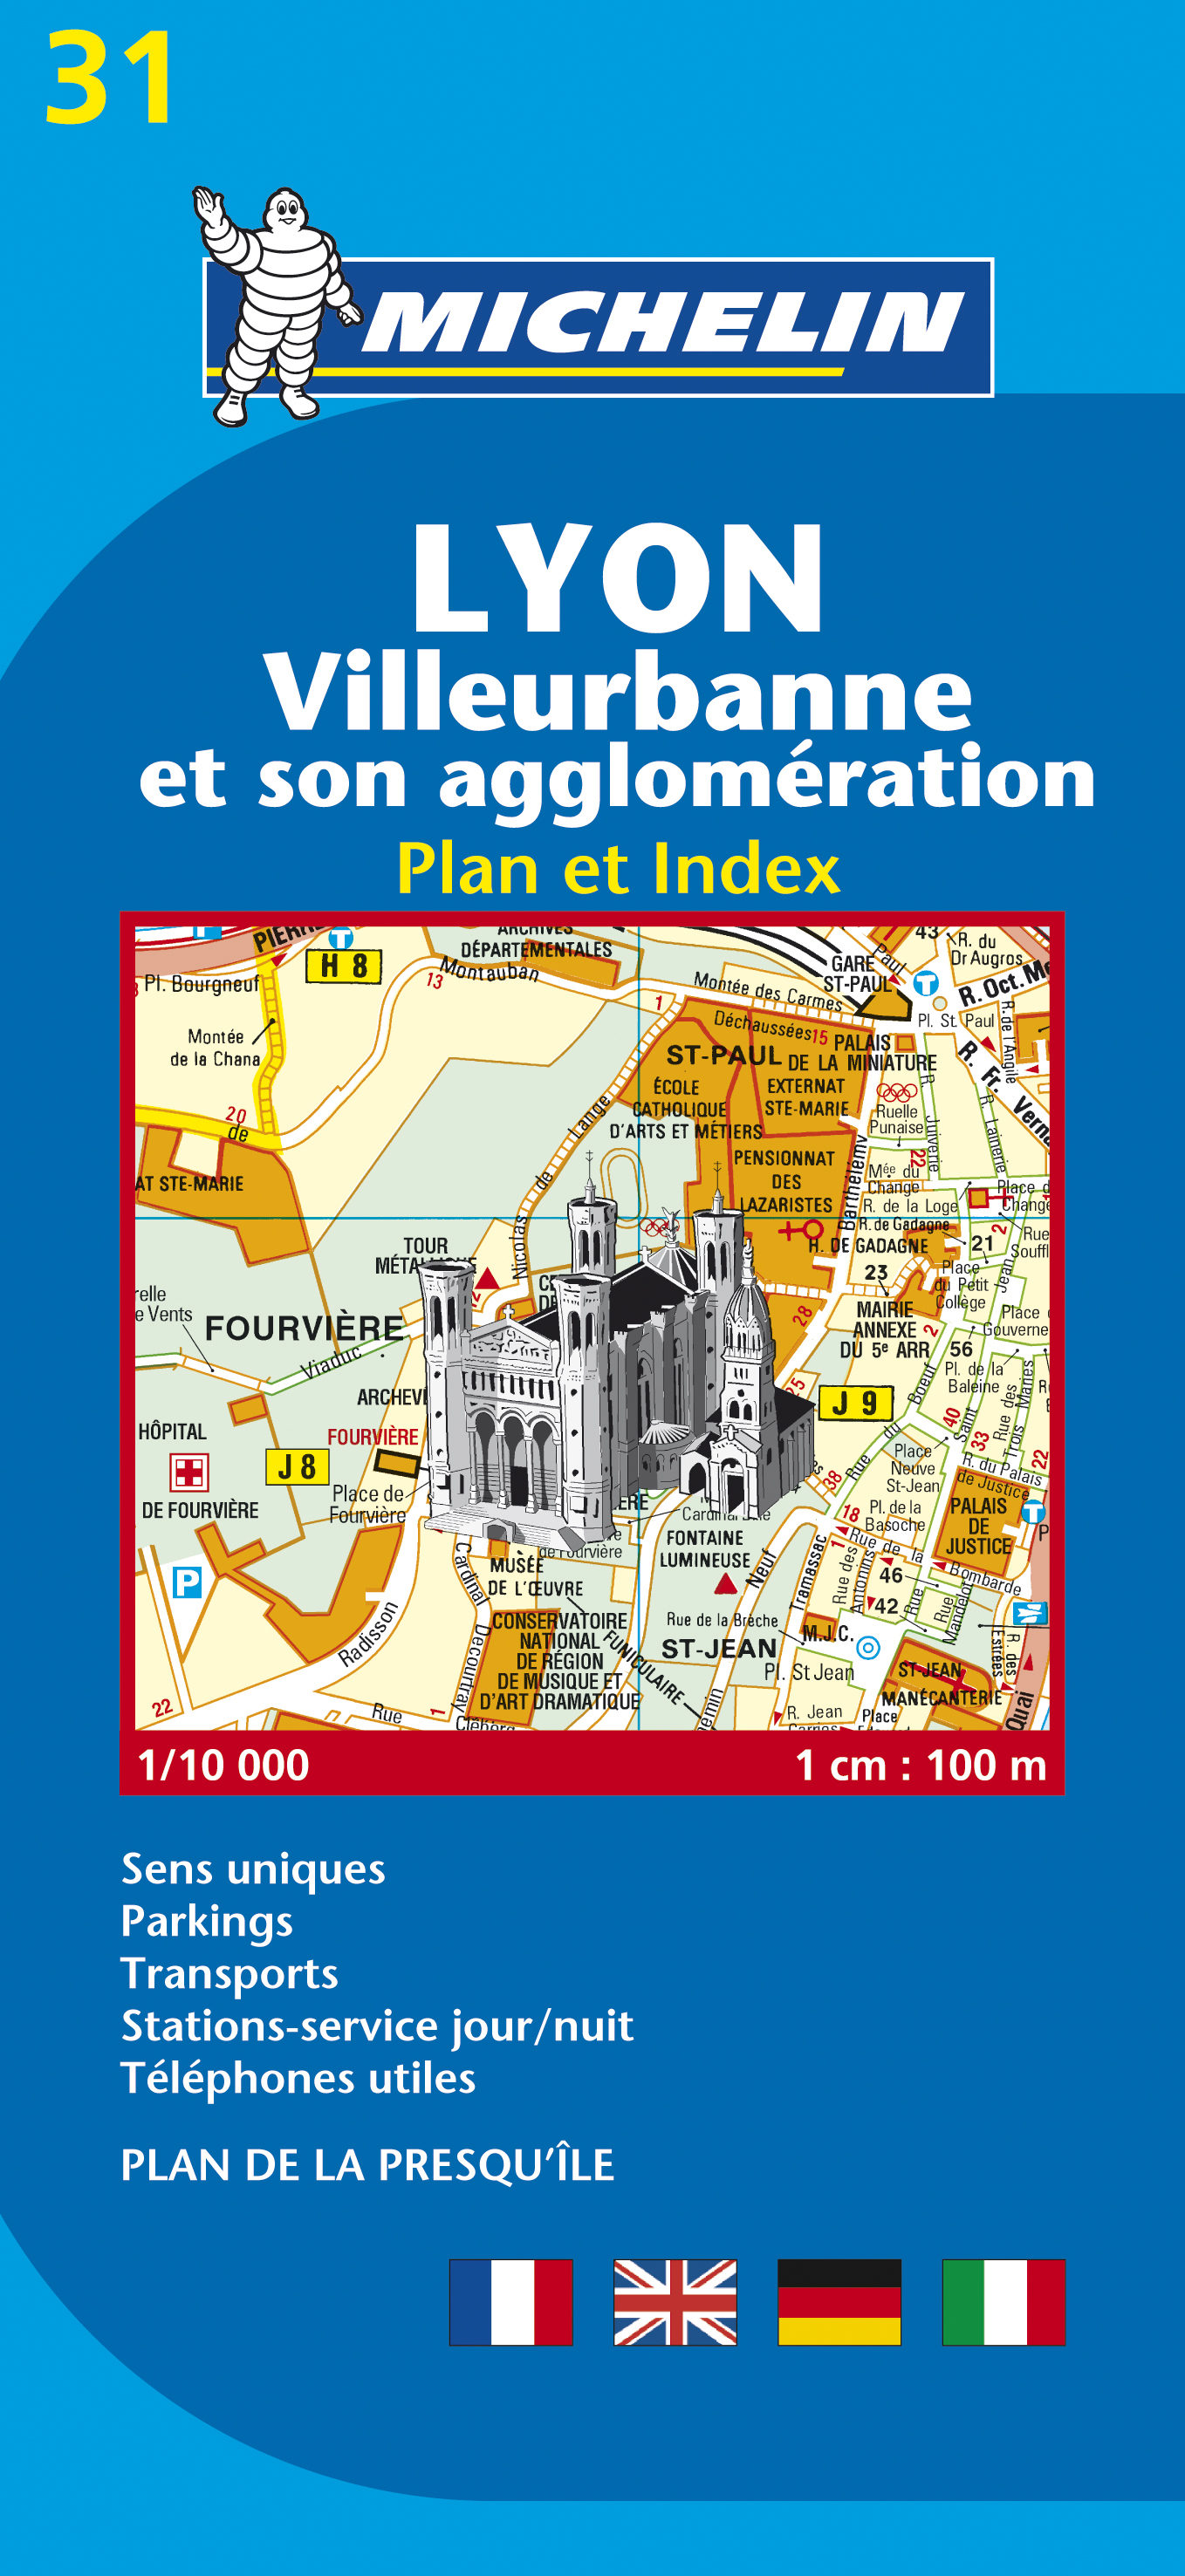 Plano Michelin 31 Lyon Con Callejero por Vv.aa.